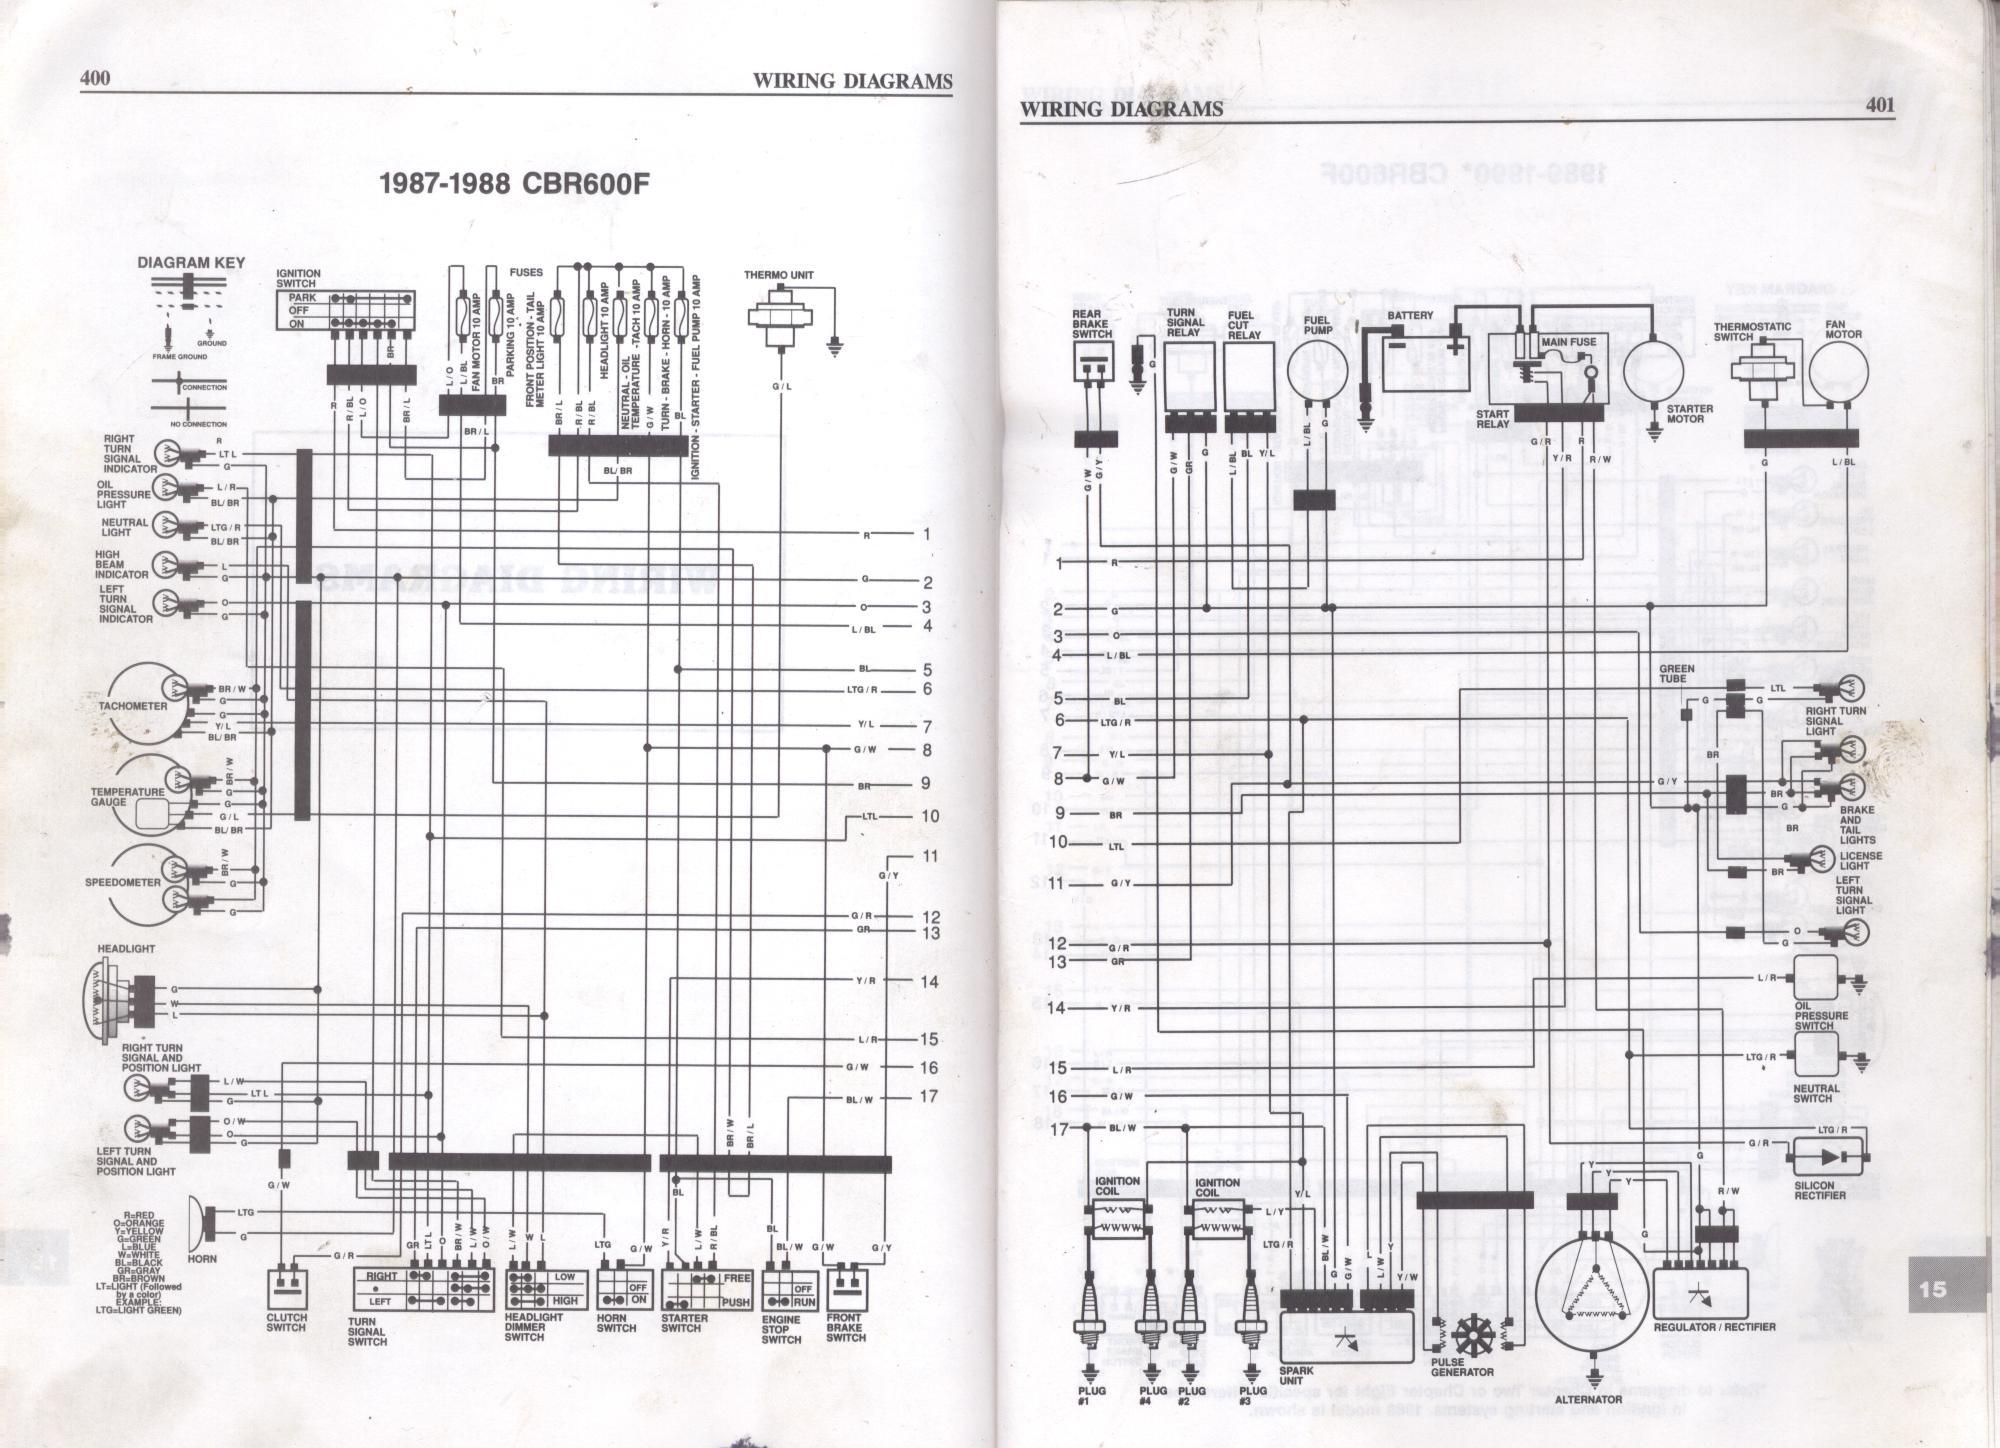 1987 Yamaha Virago 1100 Wiring Diagram Just Wirings 1983 500 Diagrams Rh Nashvilleflorists Co 1994 Review 1996